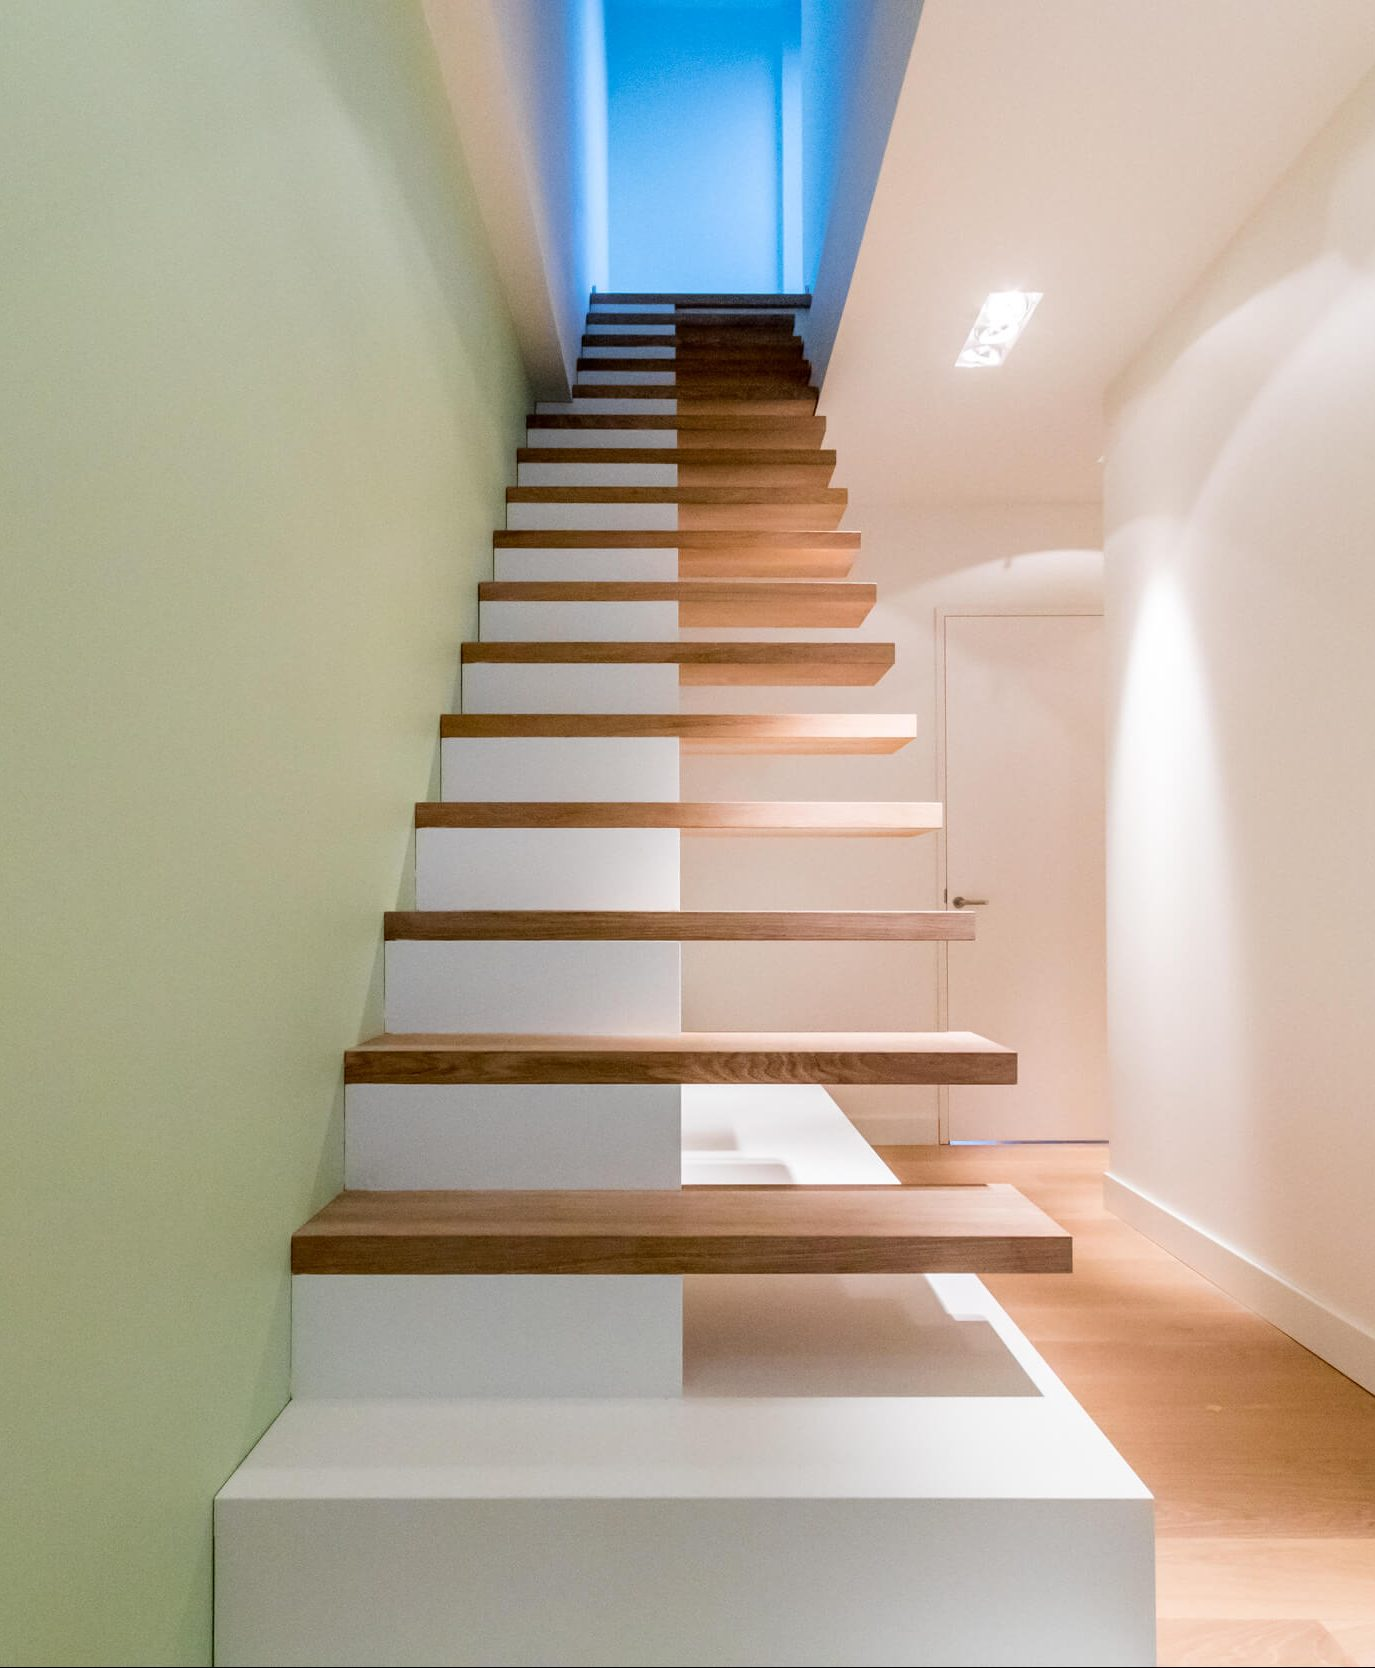 Rechte trap met opbergruimte